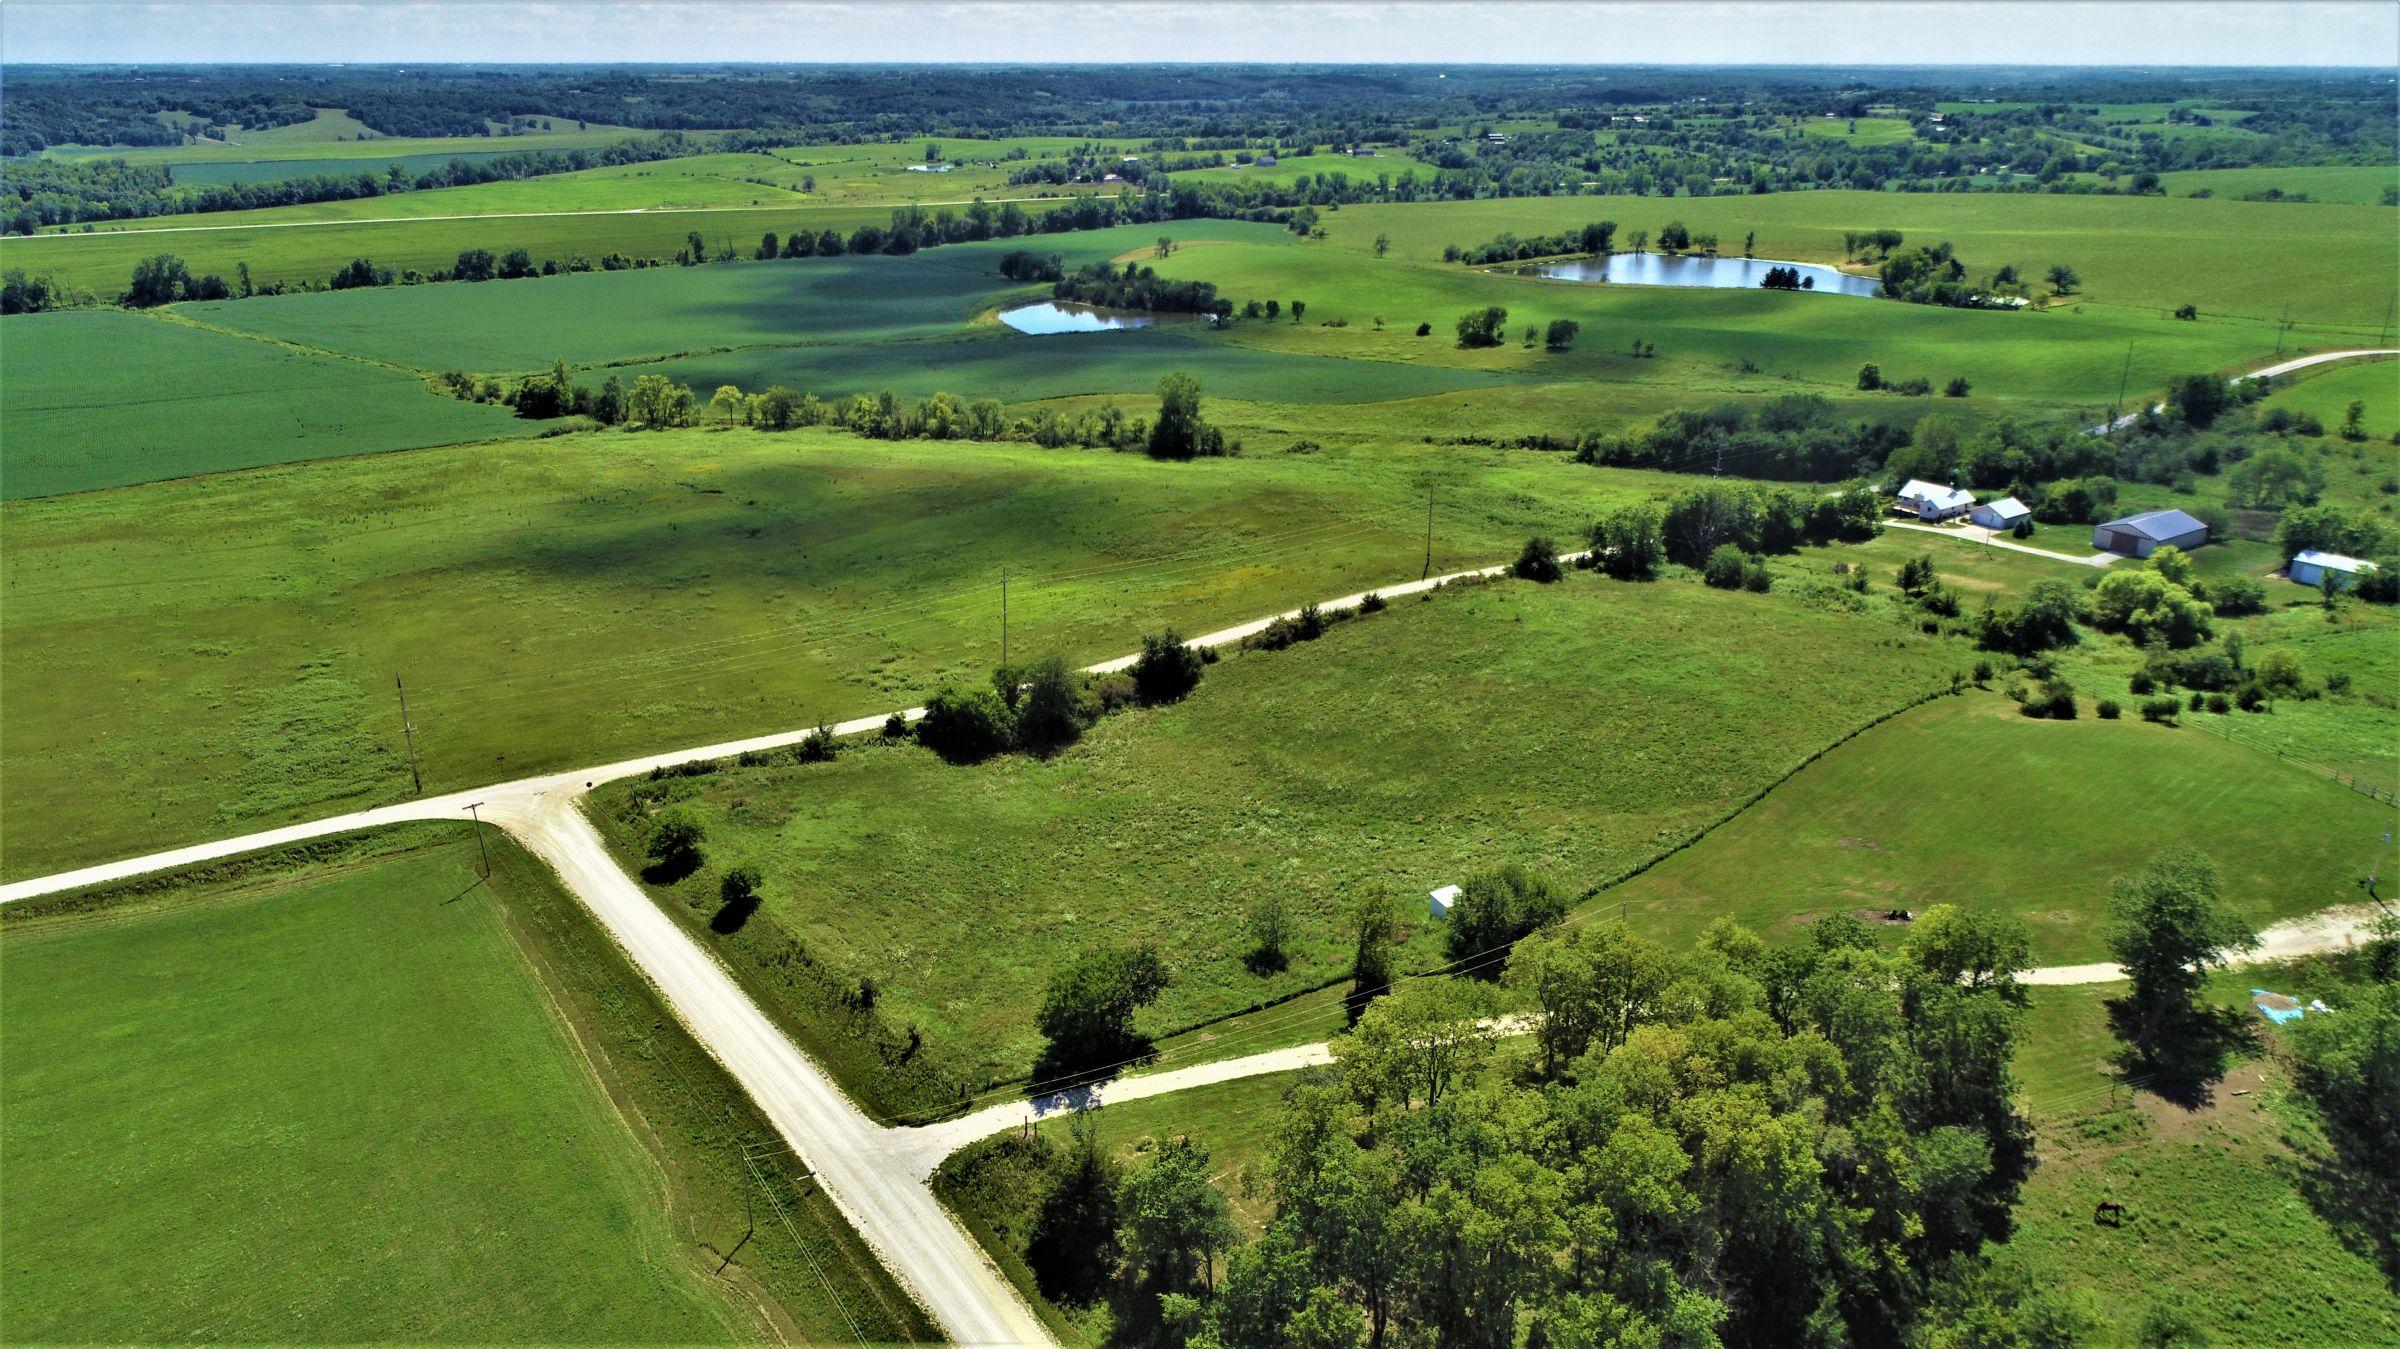 land-warren-county-iowa-6-acres-listing-number-15709-3-2021-08-27-202005.JPG